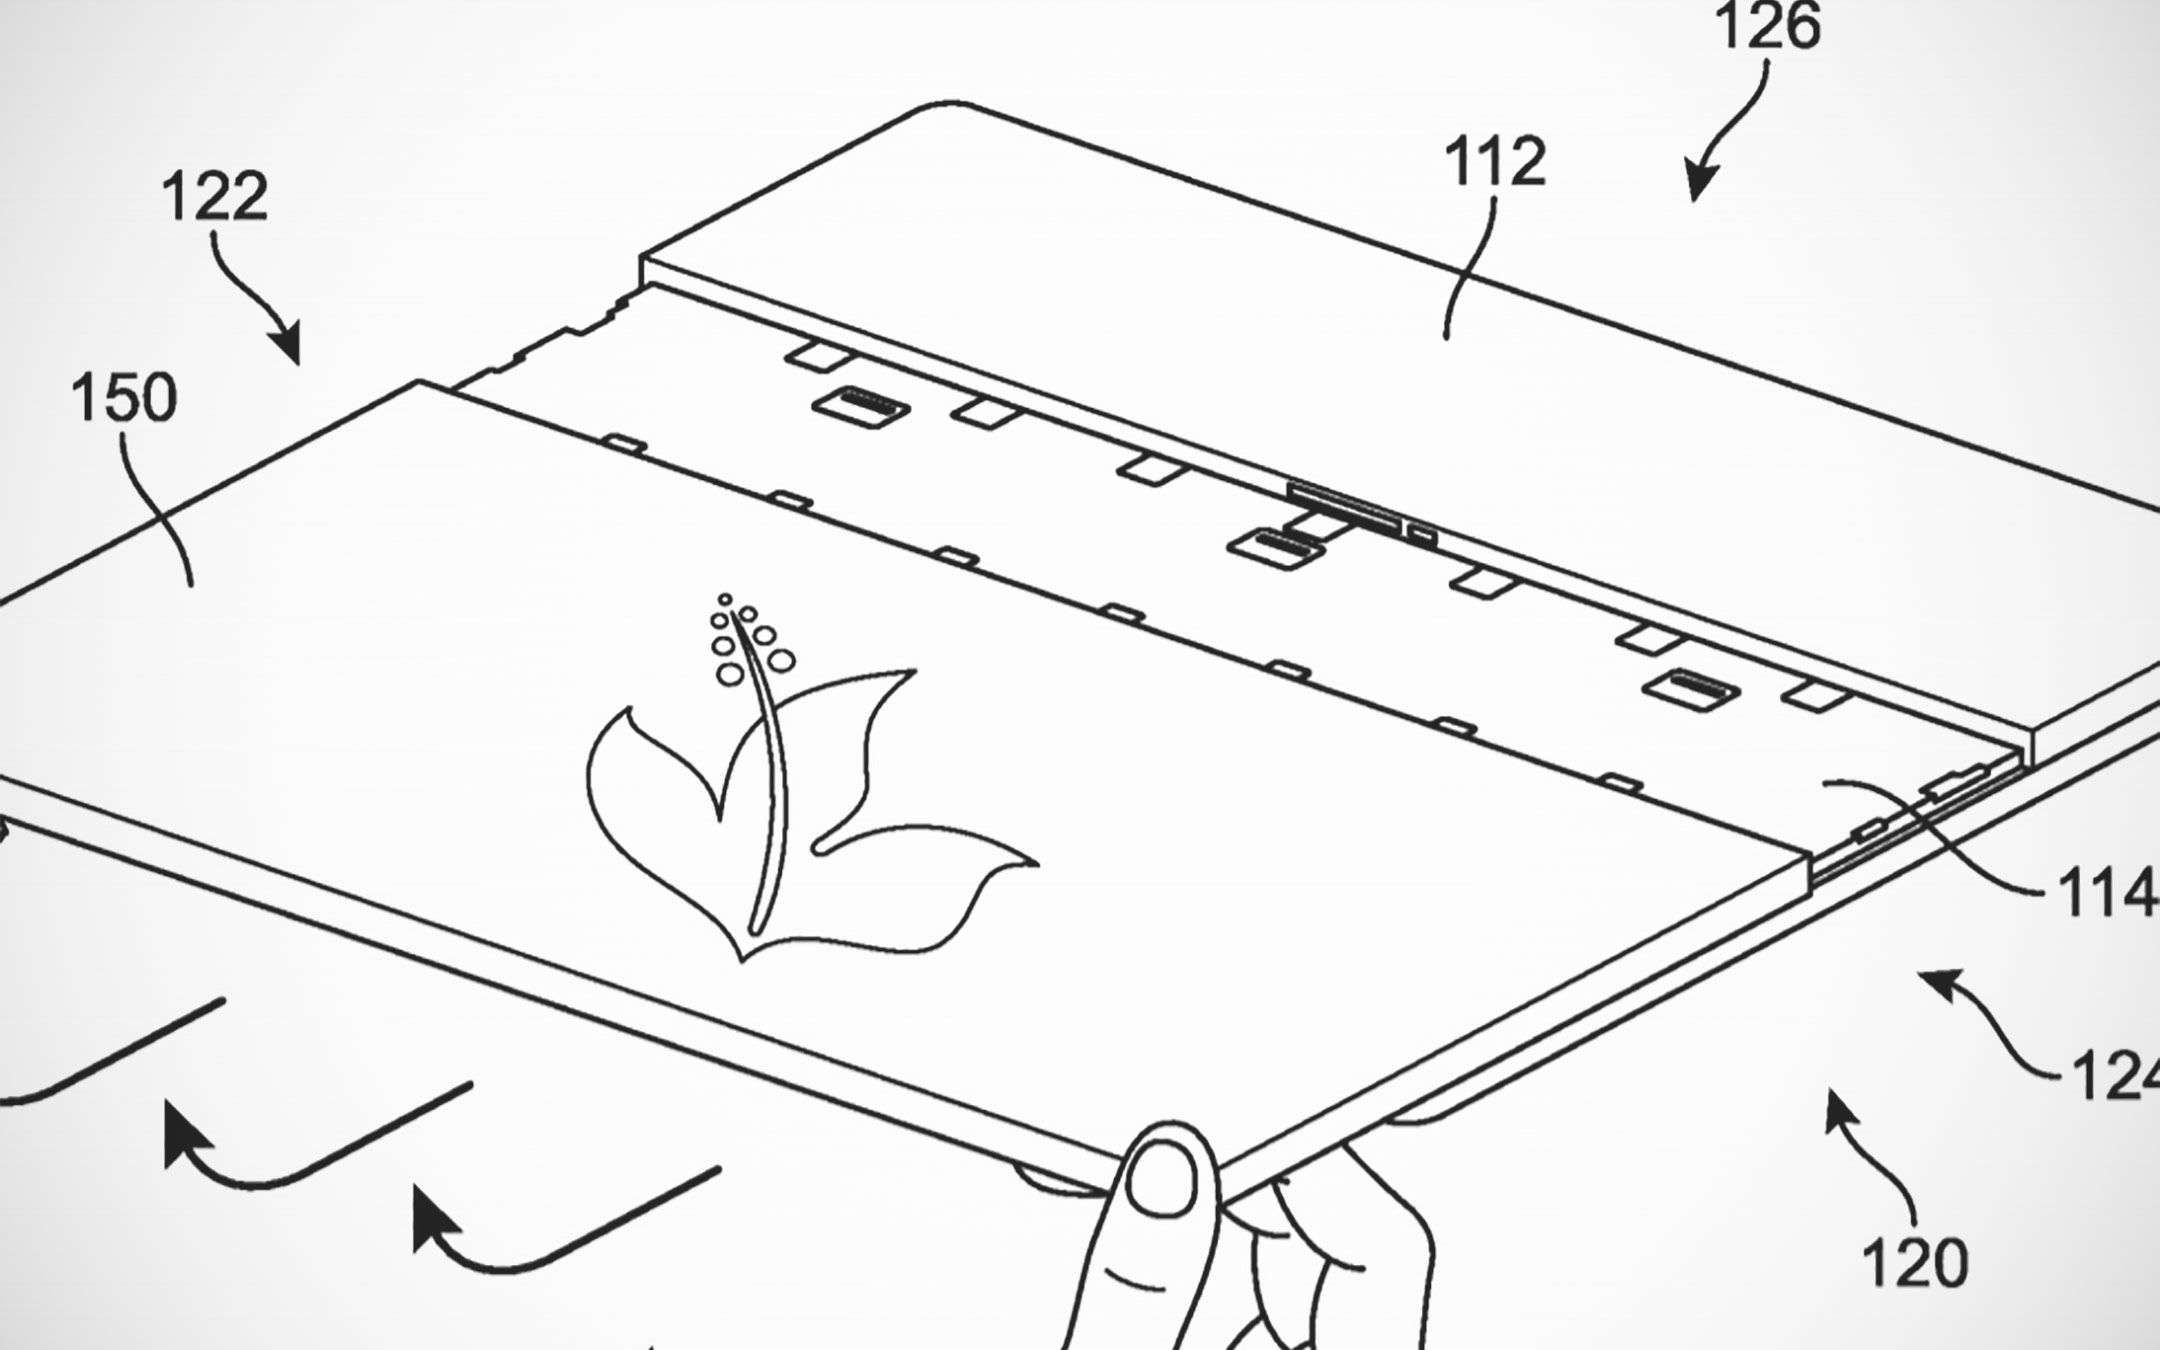 Modular design for the next Microsoft Surface?